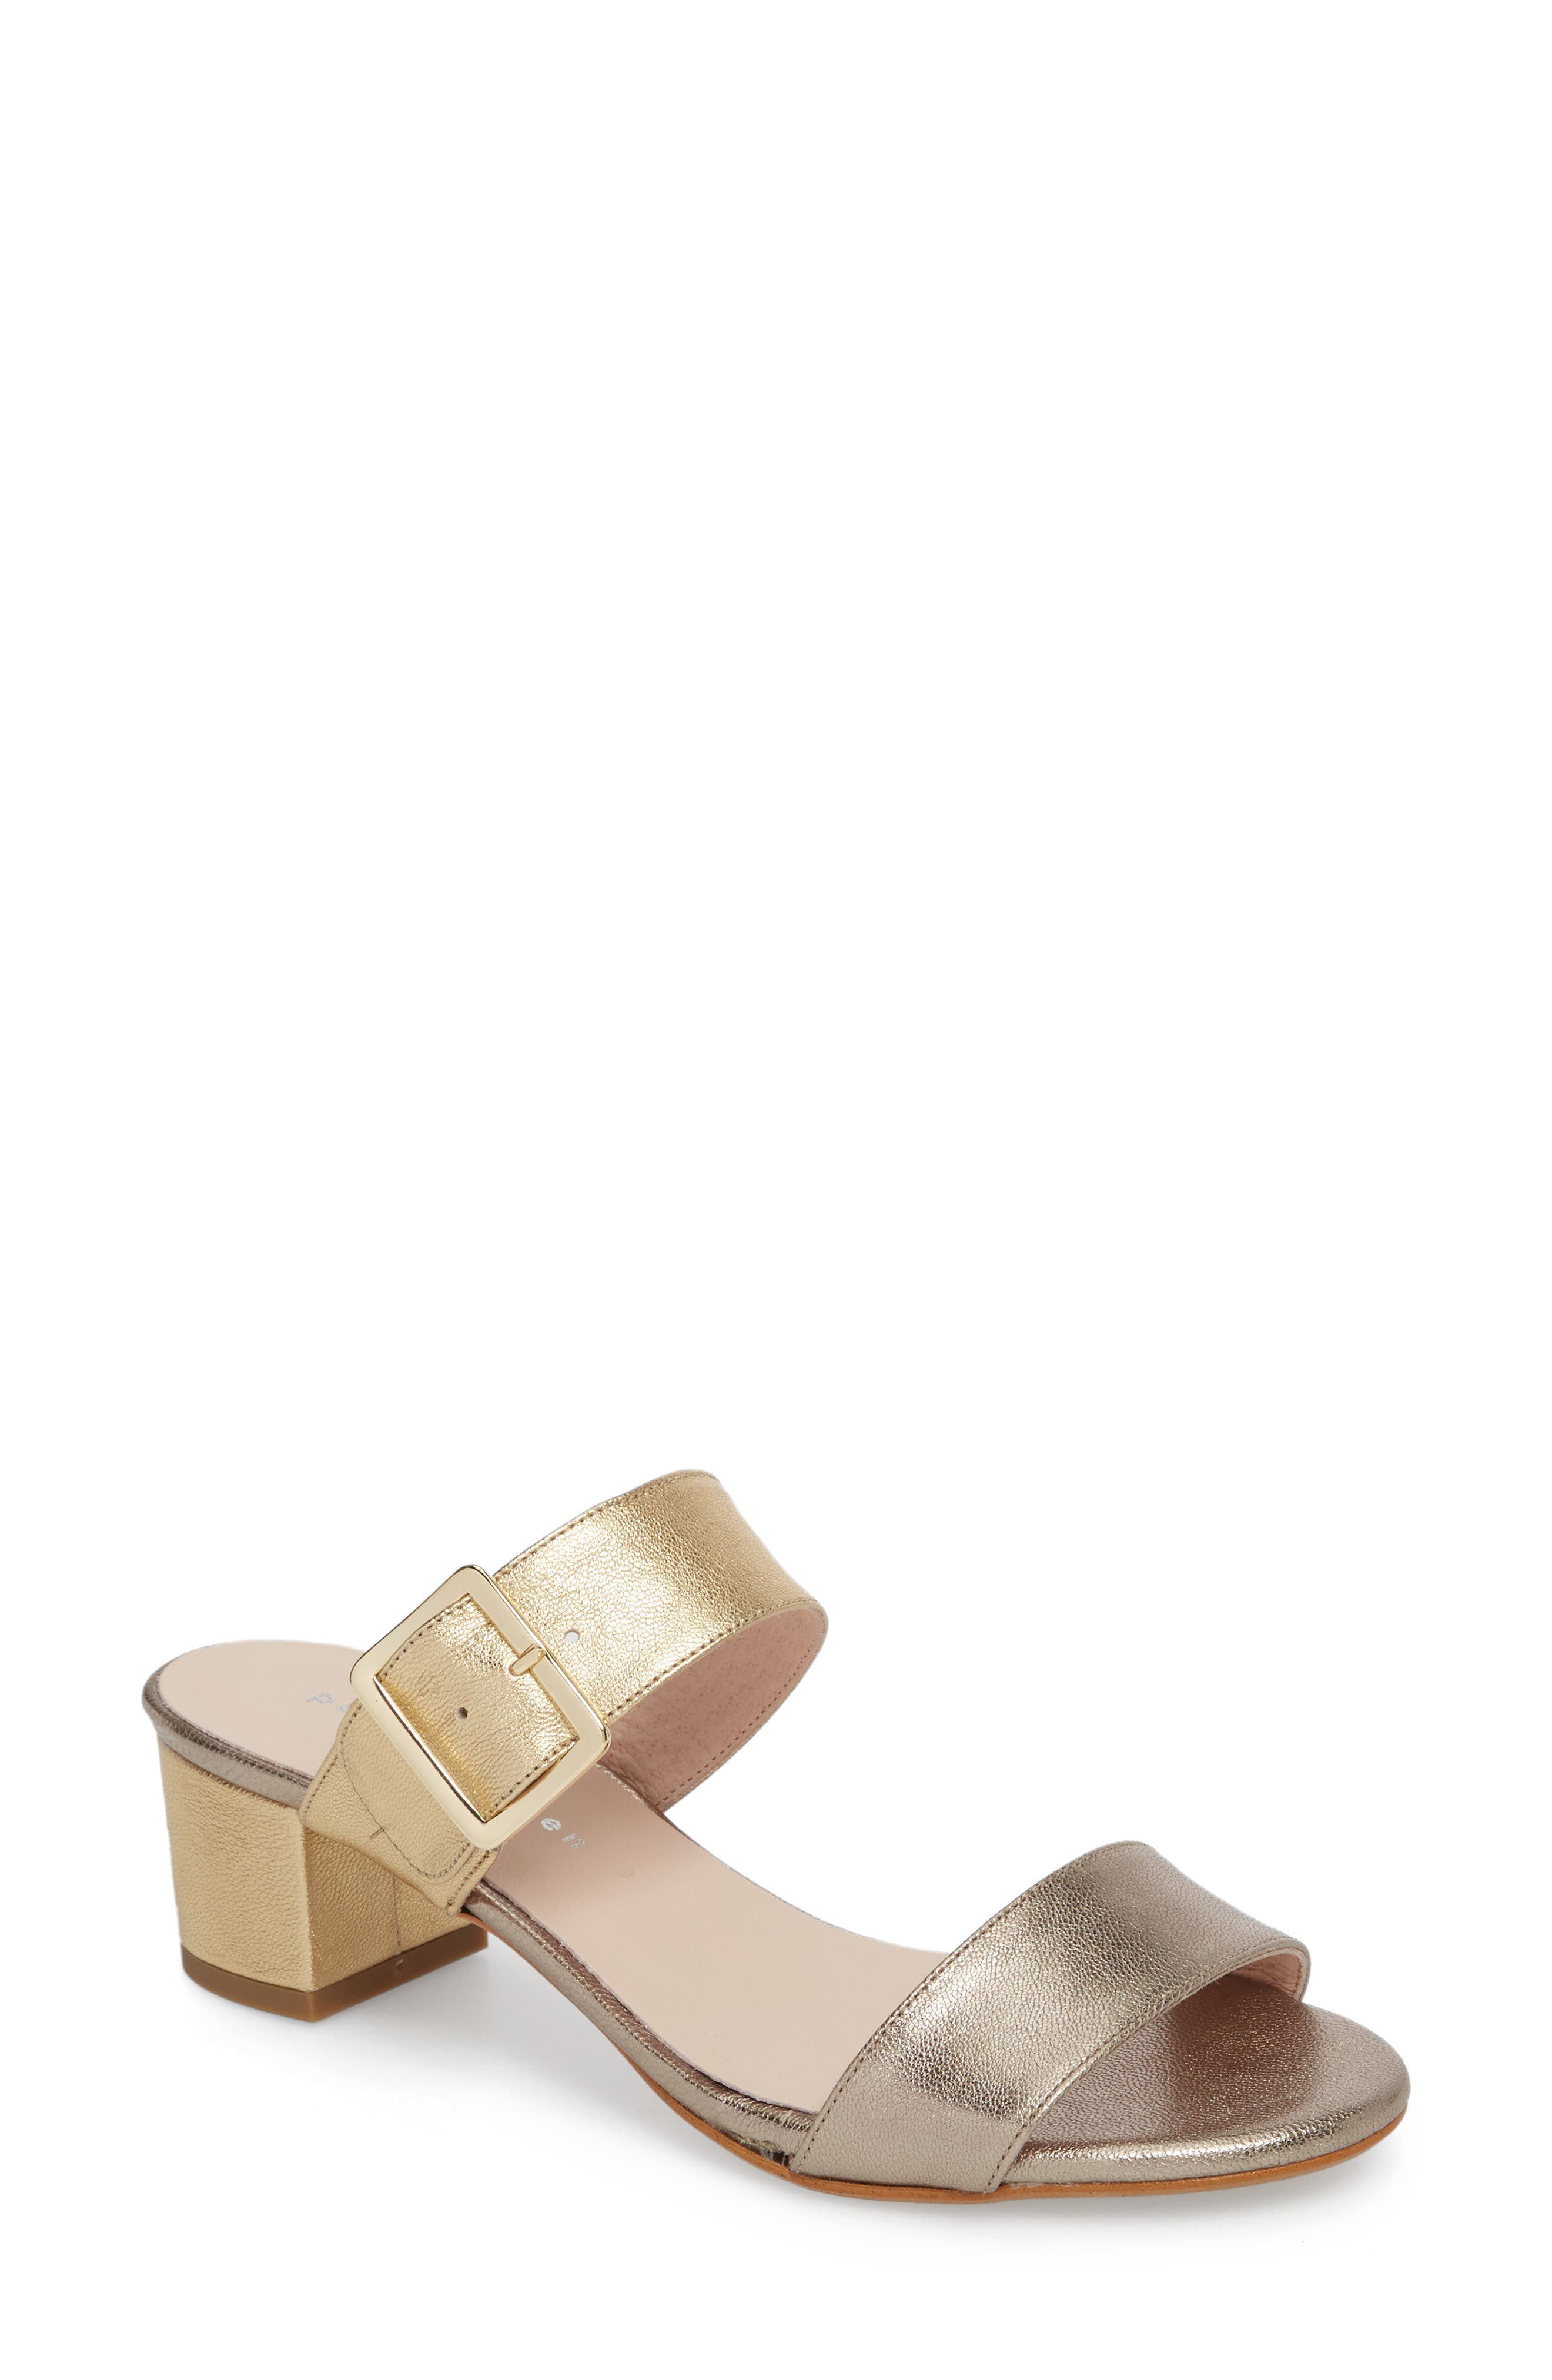 Patricia Green Ruth Slide Sandal, Metallic